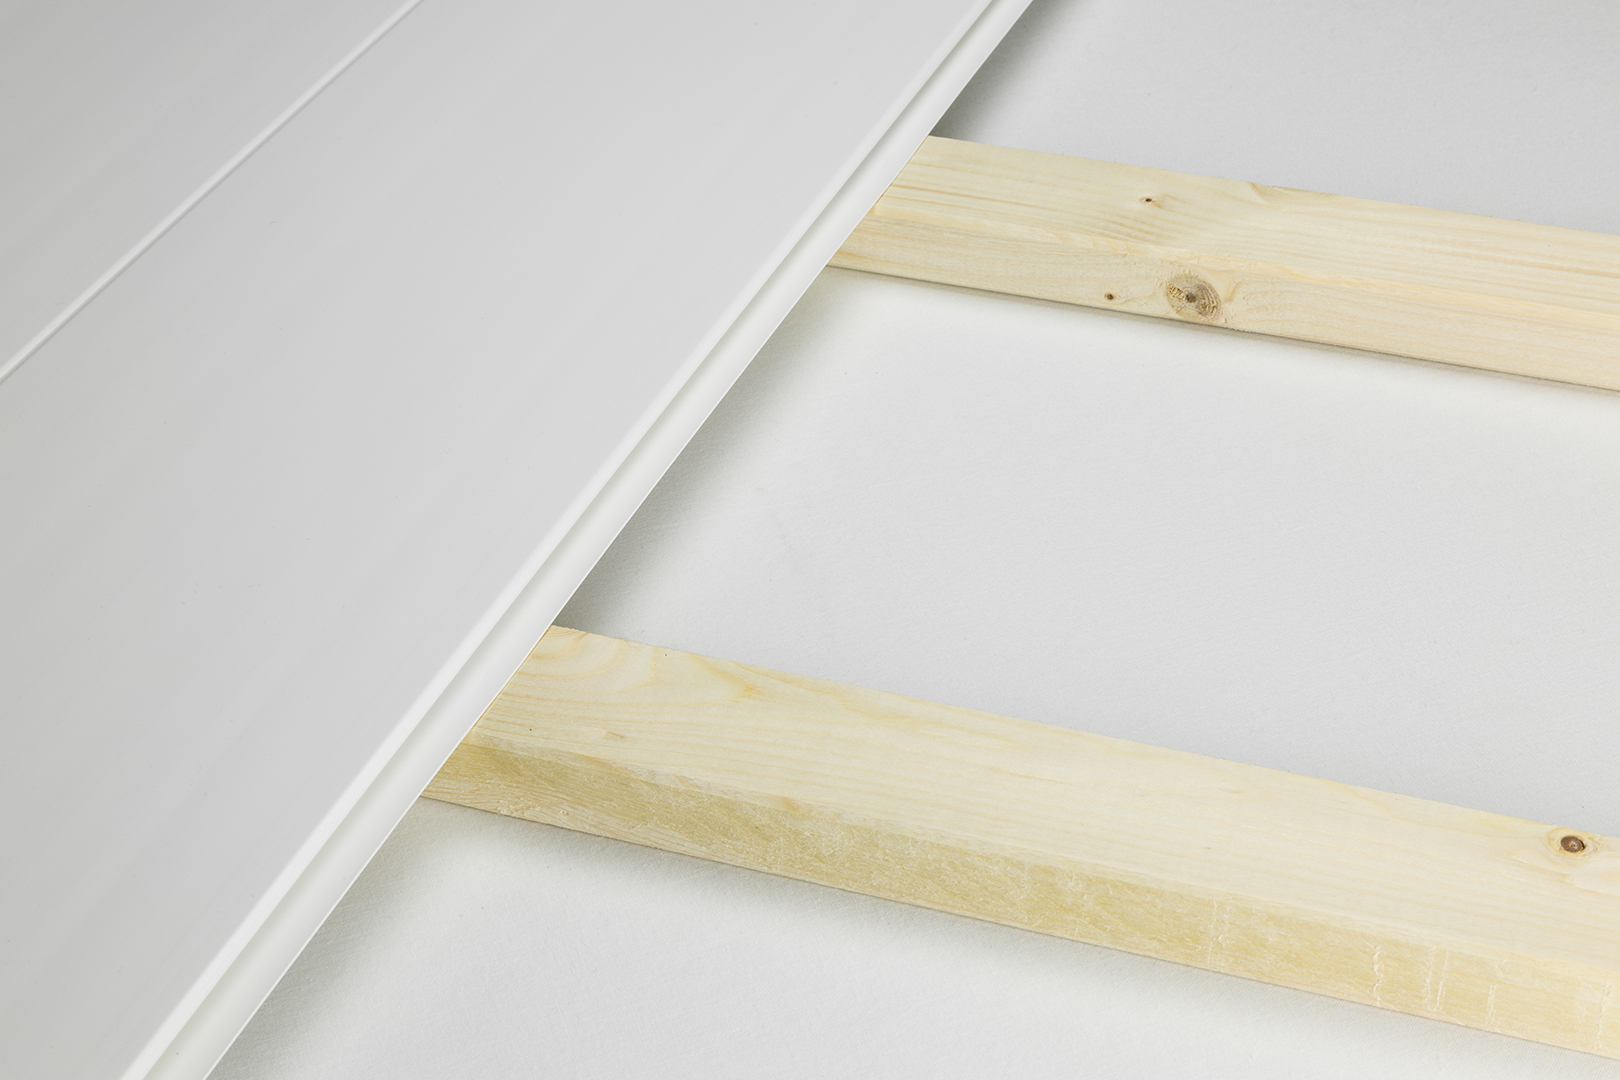 verarbeitungshinweise der pvc paneele. Black Bedroom Furniture Sets. Home Design Ideas